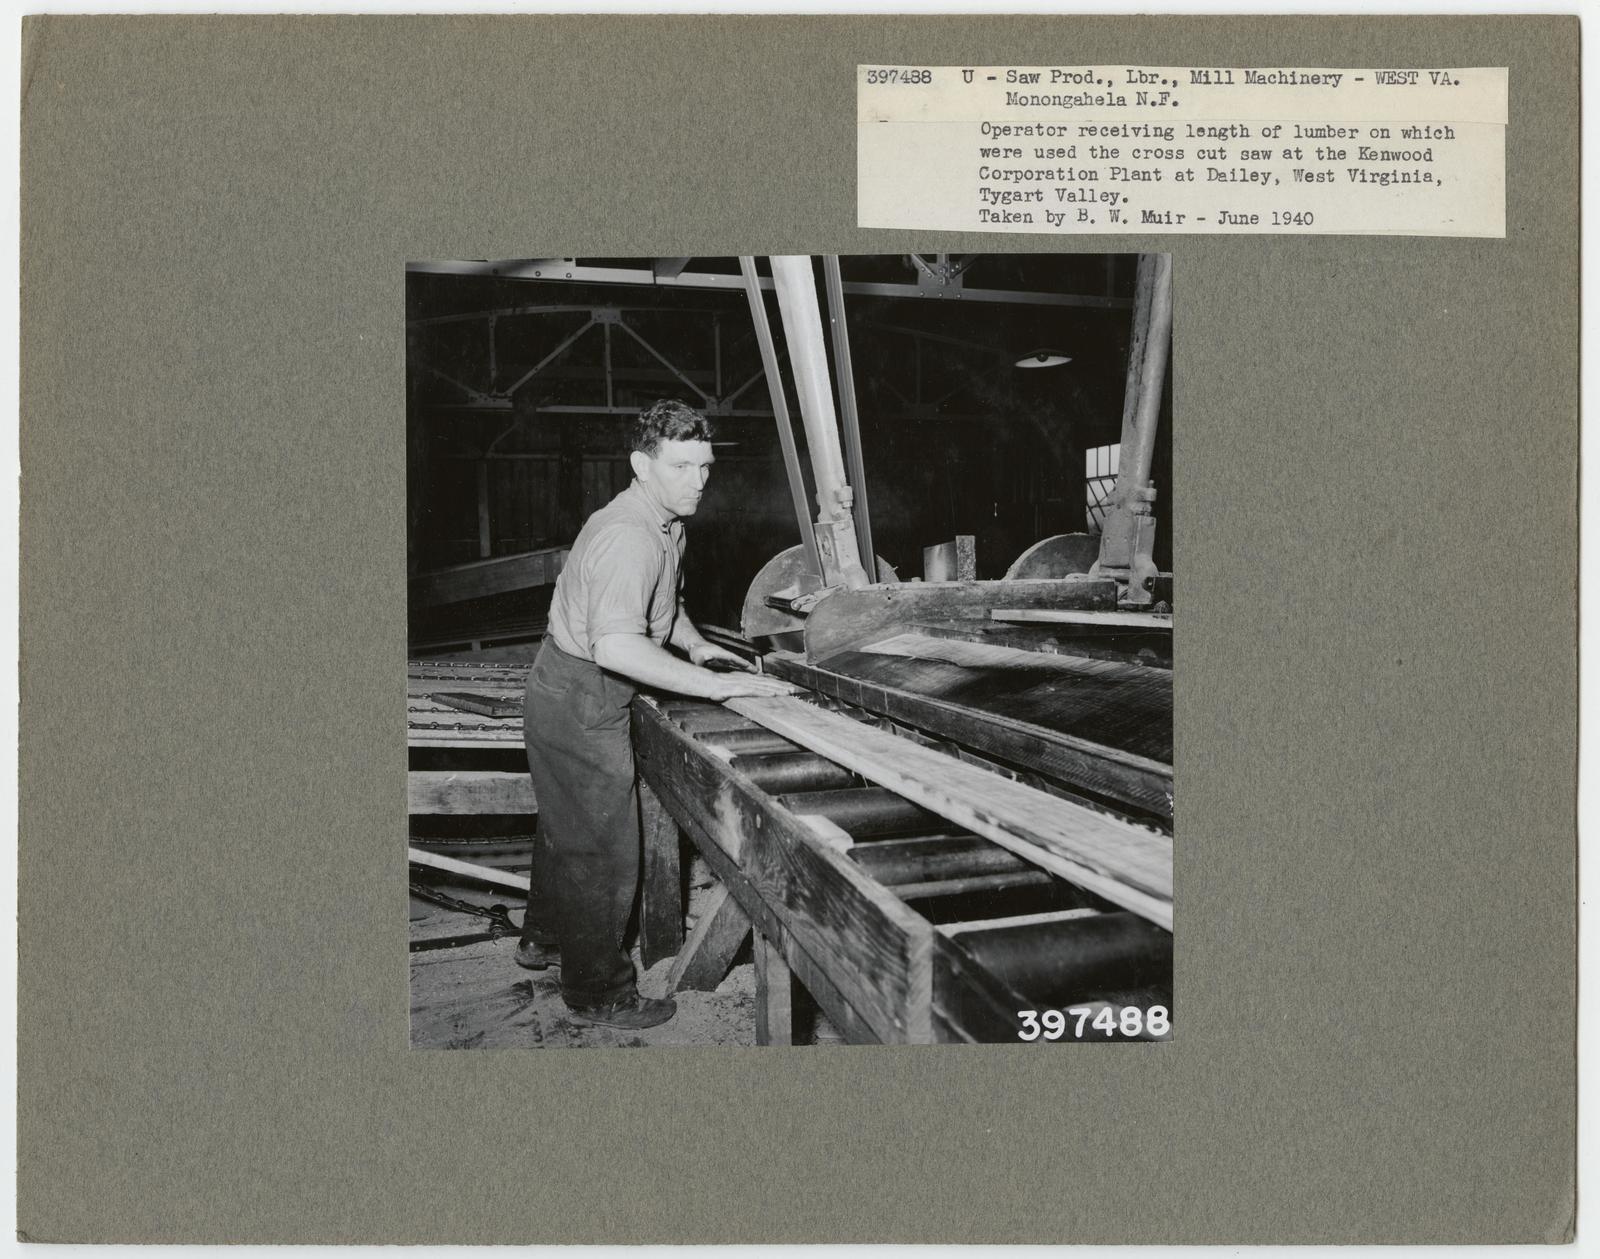 Sawmill Interiors - West Virginia